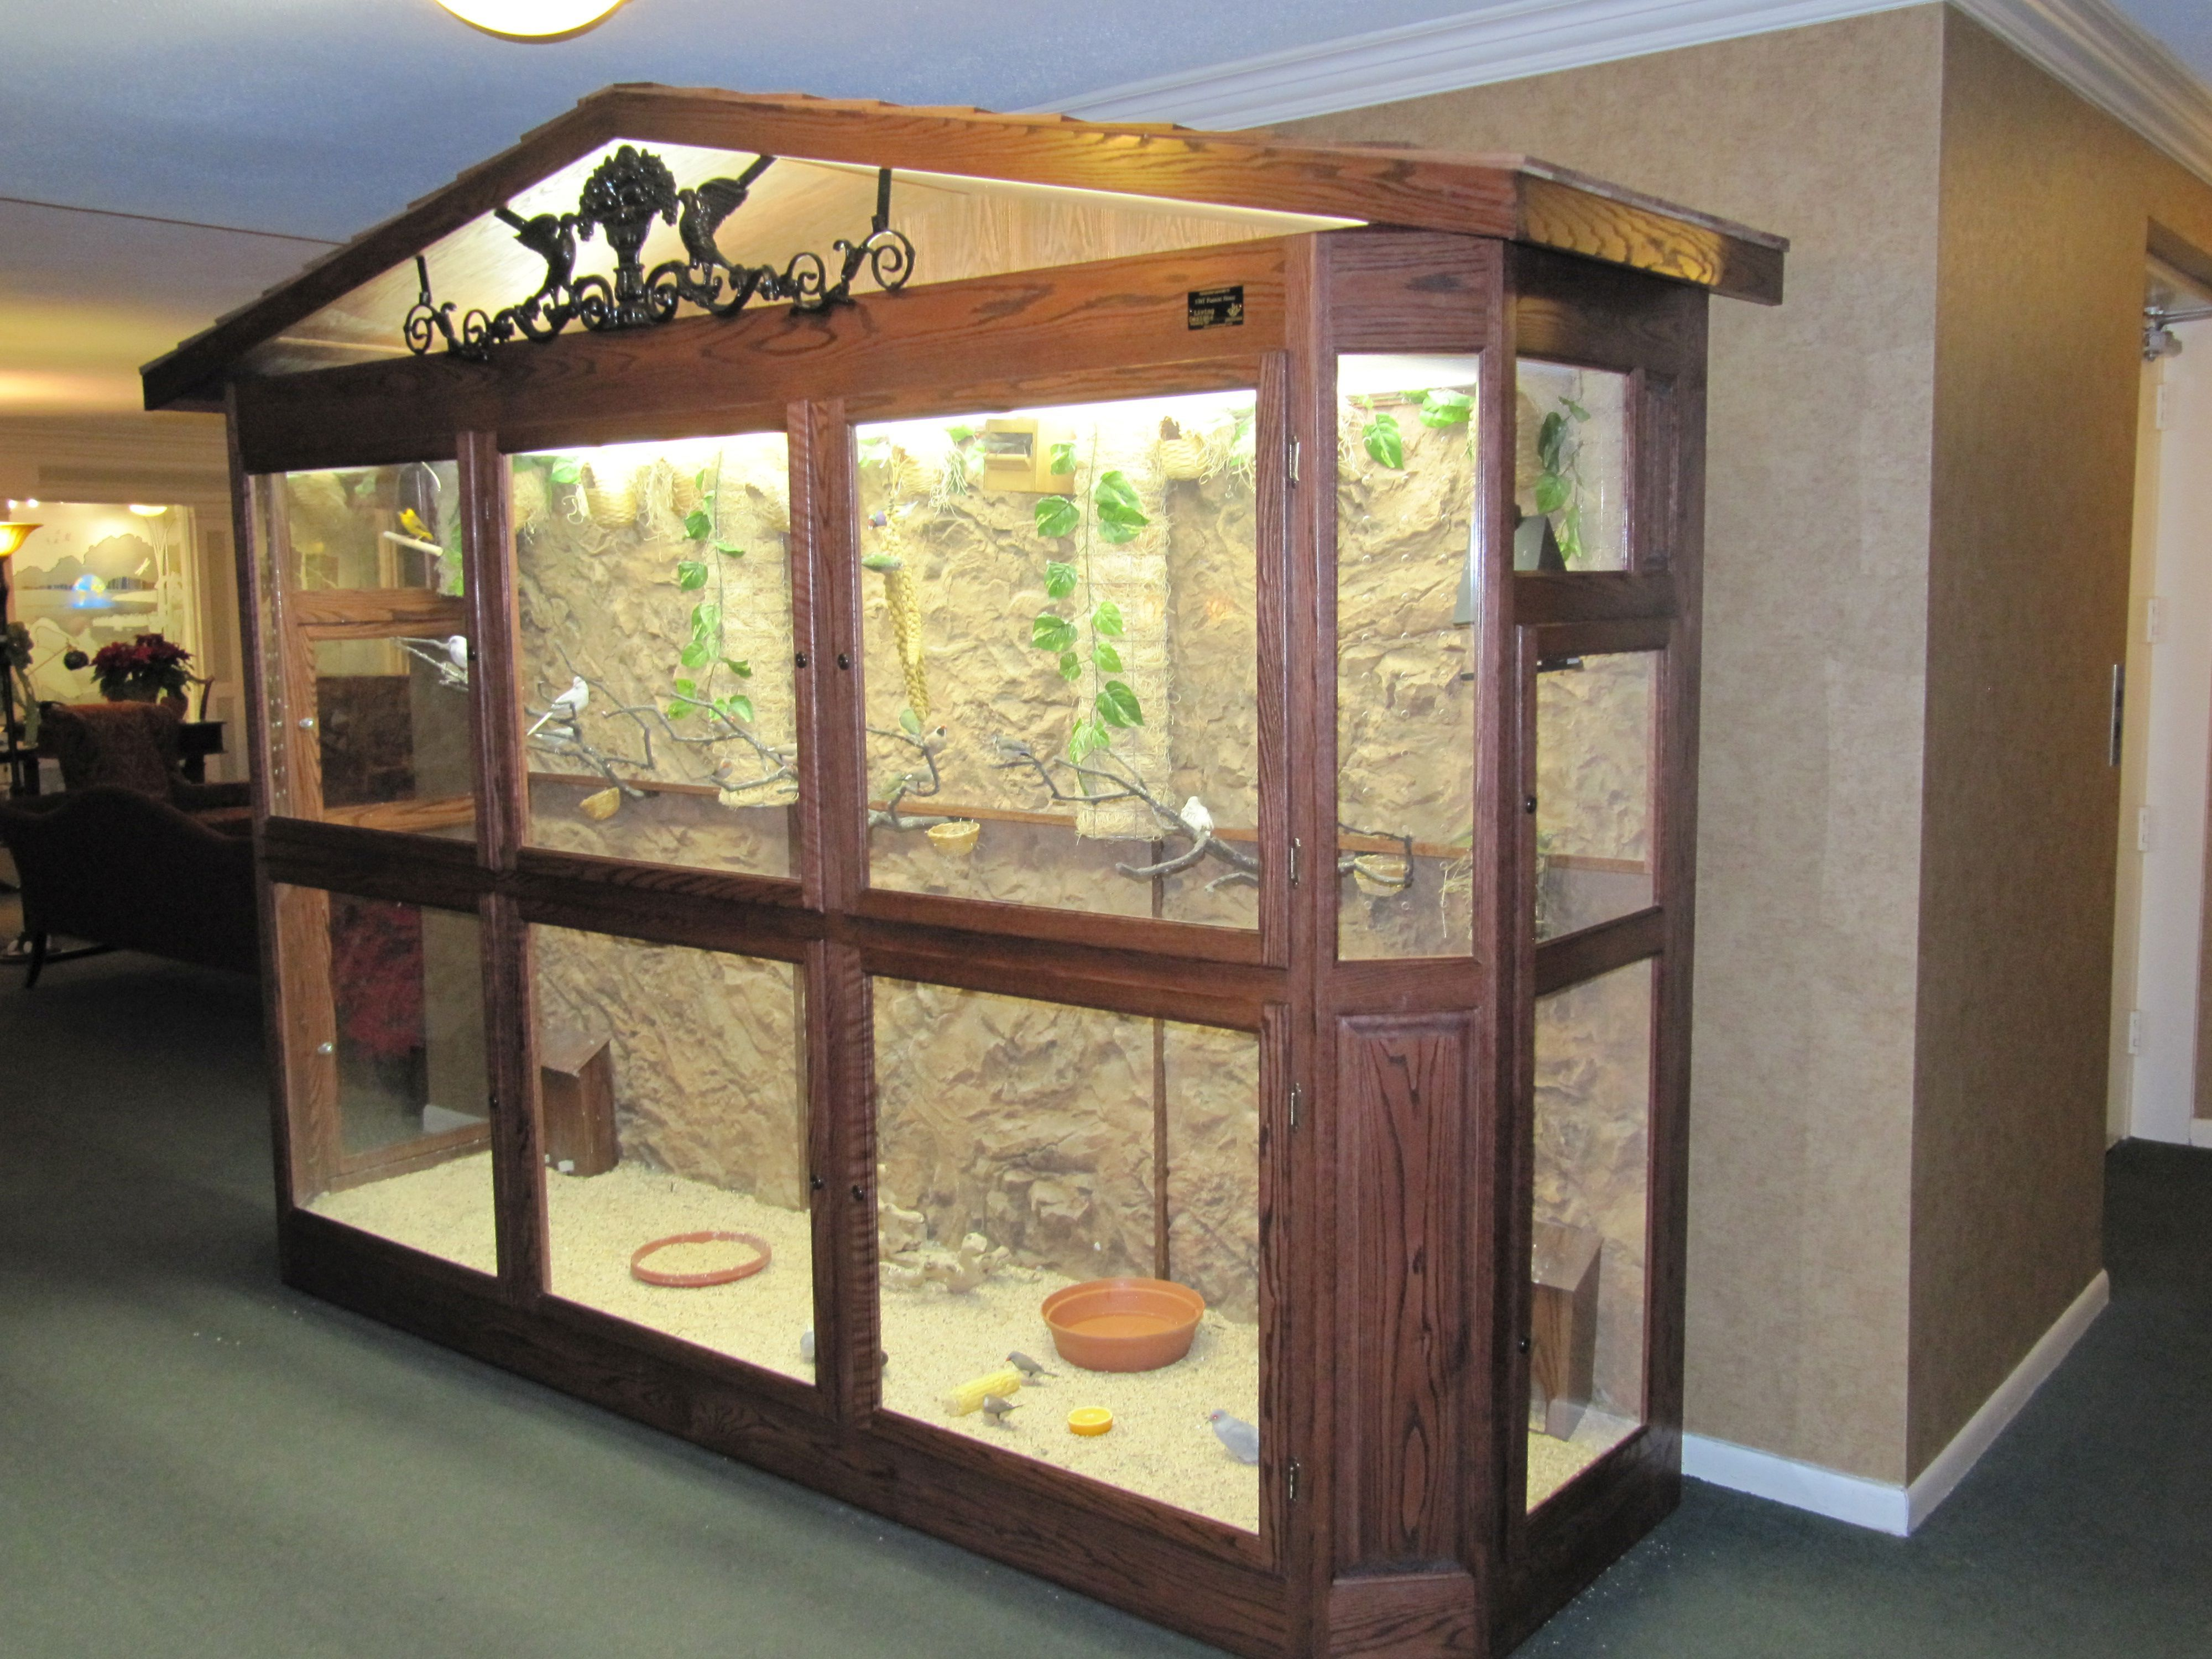 diy bird aviary Diy bird cage, Large bird cages, Bird aviary